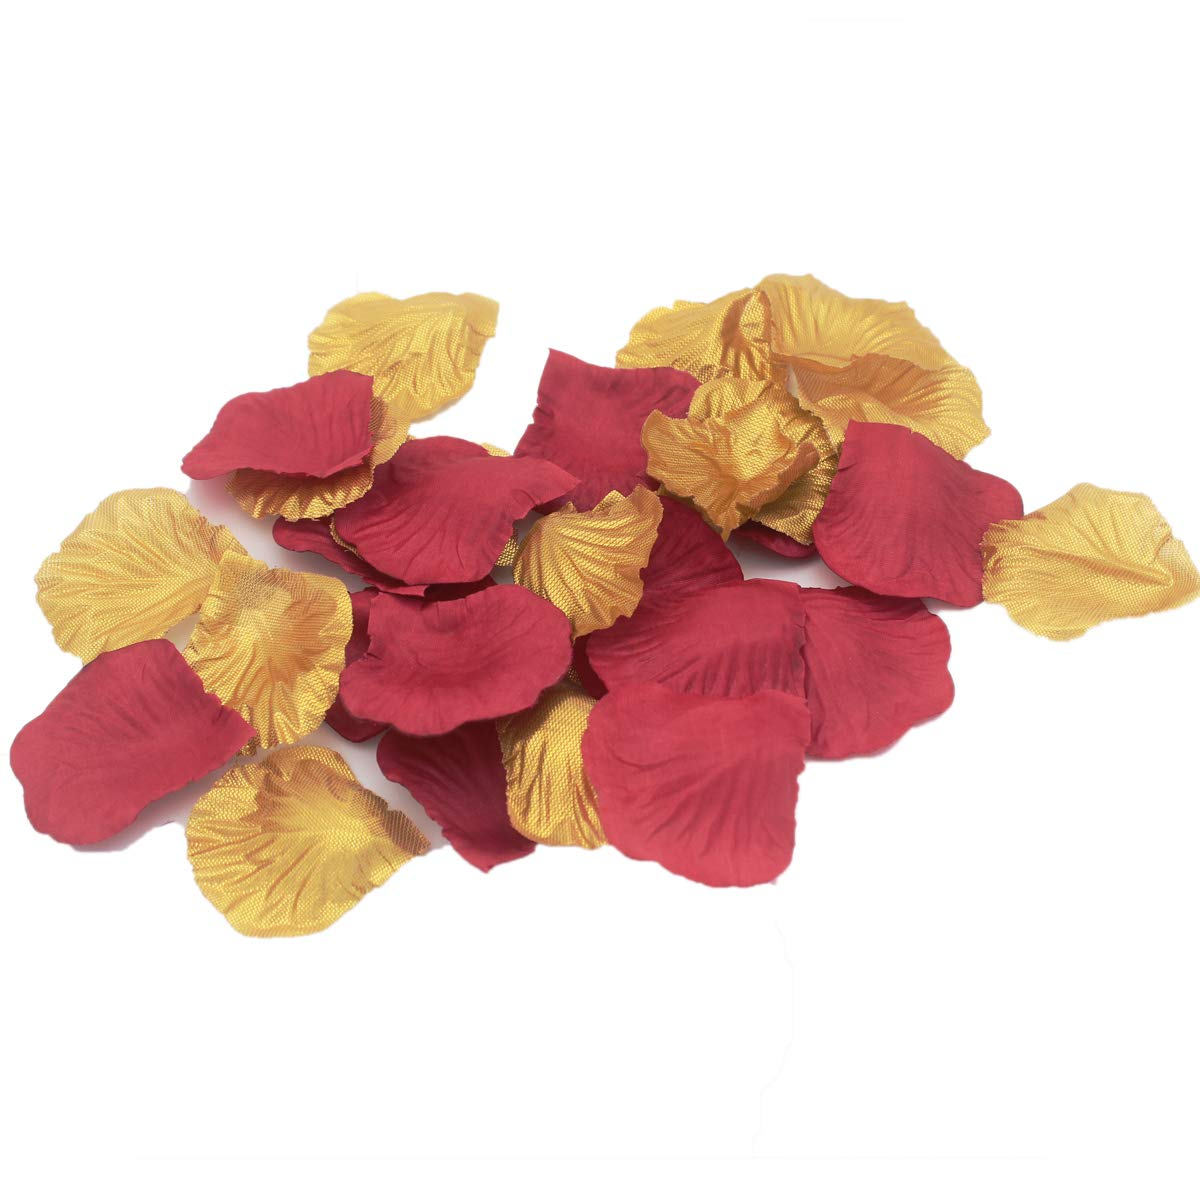 ALLHEARTDESIRES 1000PCS Maroon Burgundy /& Gold Artificial Flower Petals Wedding Confetti Table Scatters Centerpieces Bridal Shower Flower Girl Basket Aisle Decoration